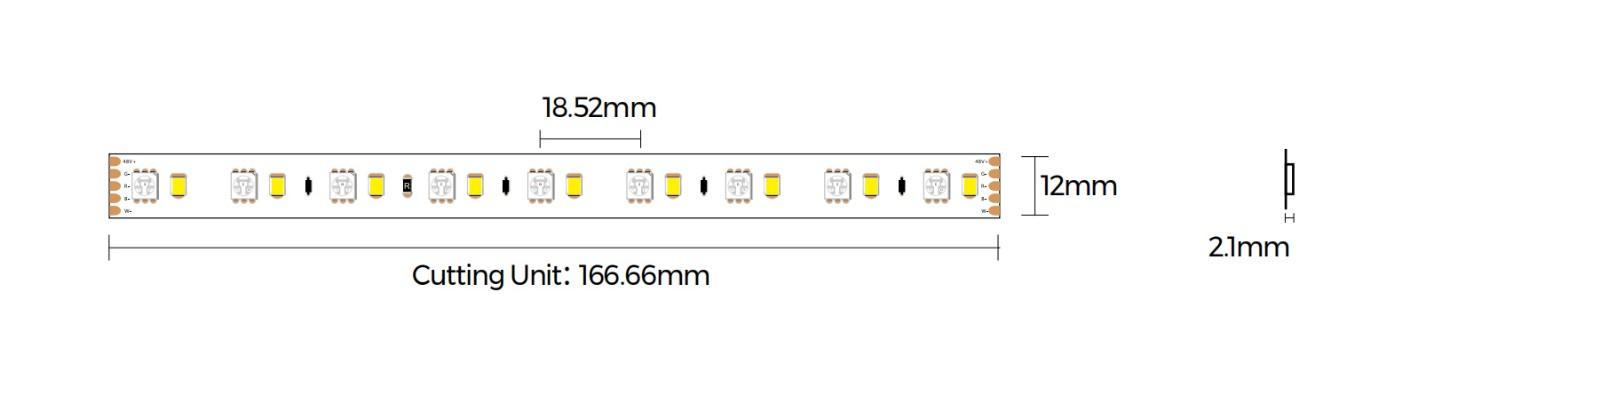 DS554RGBW-48V-12mm